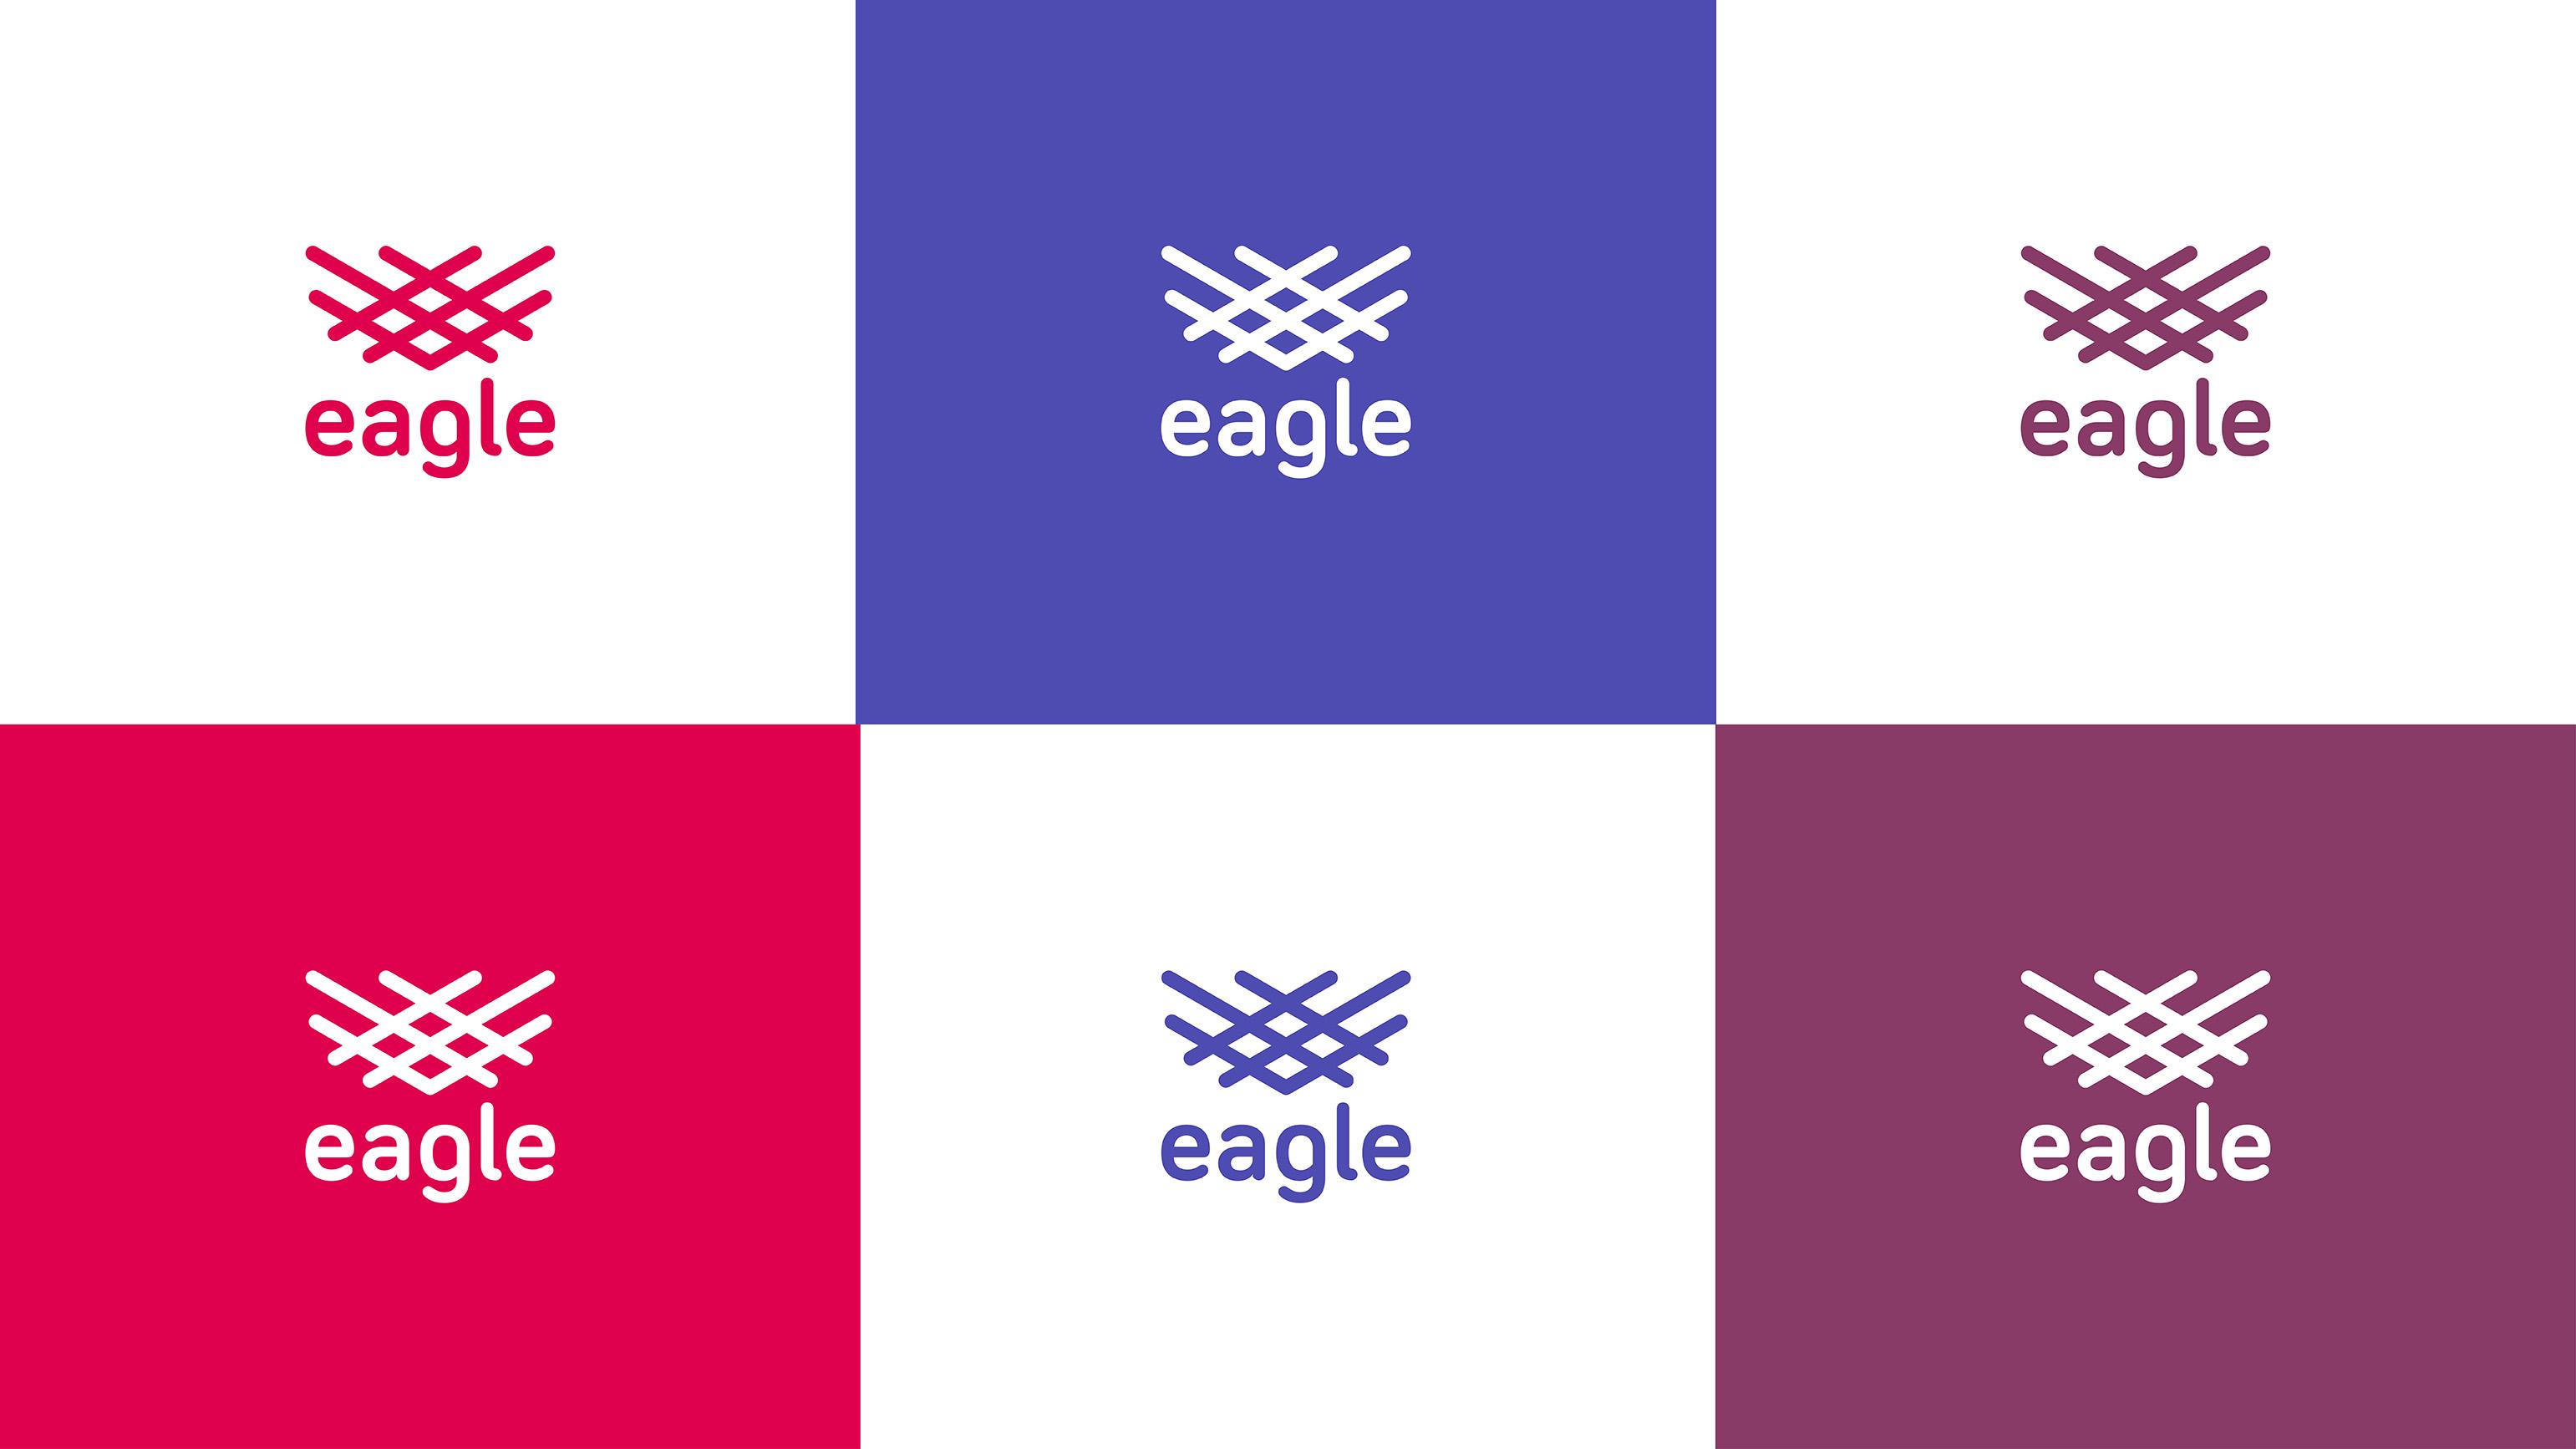 Eagle Brand Logos